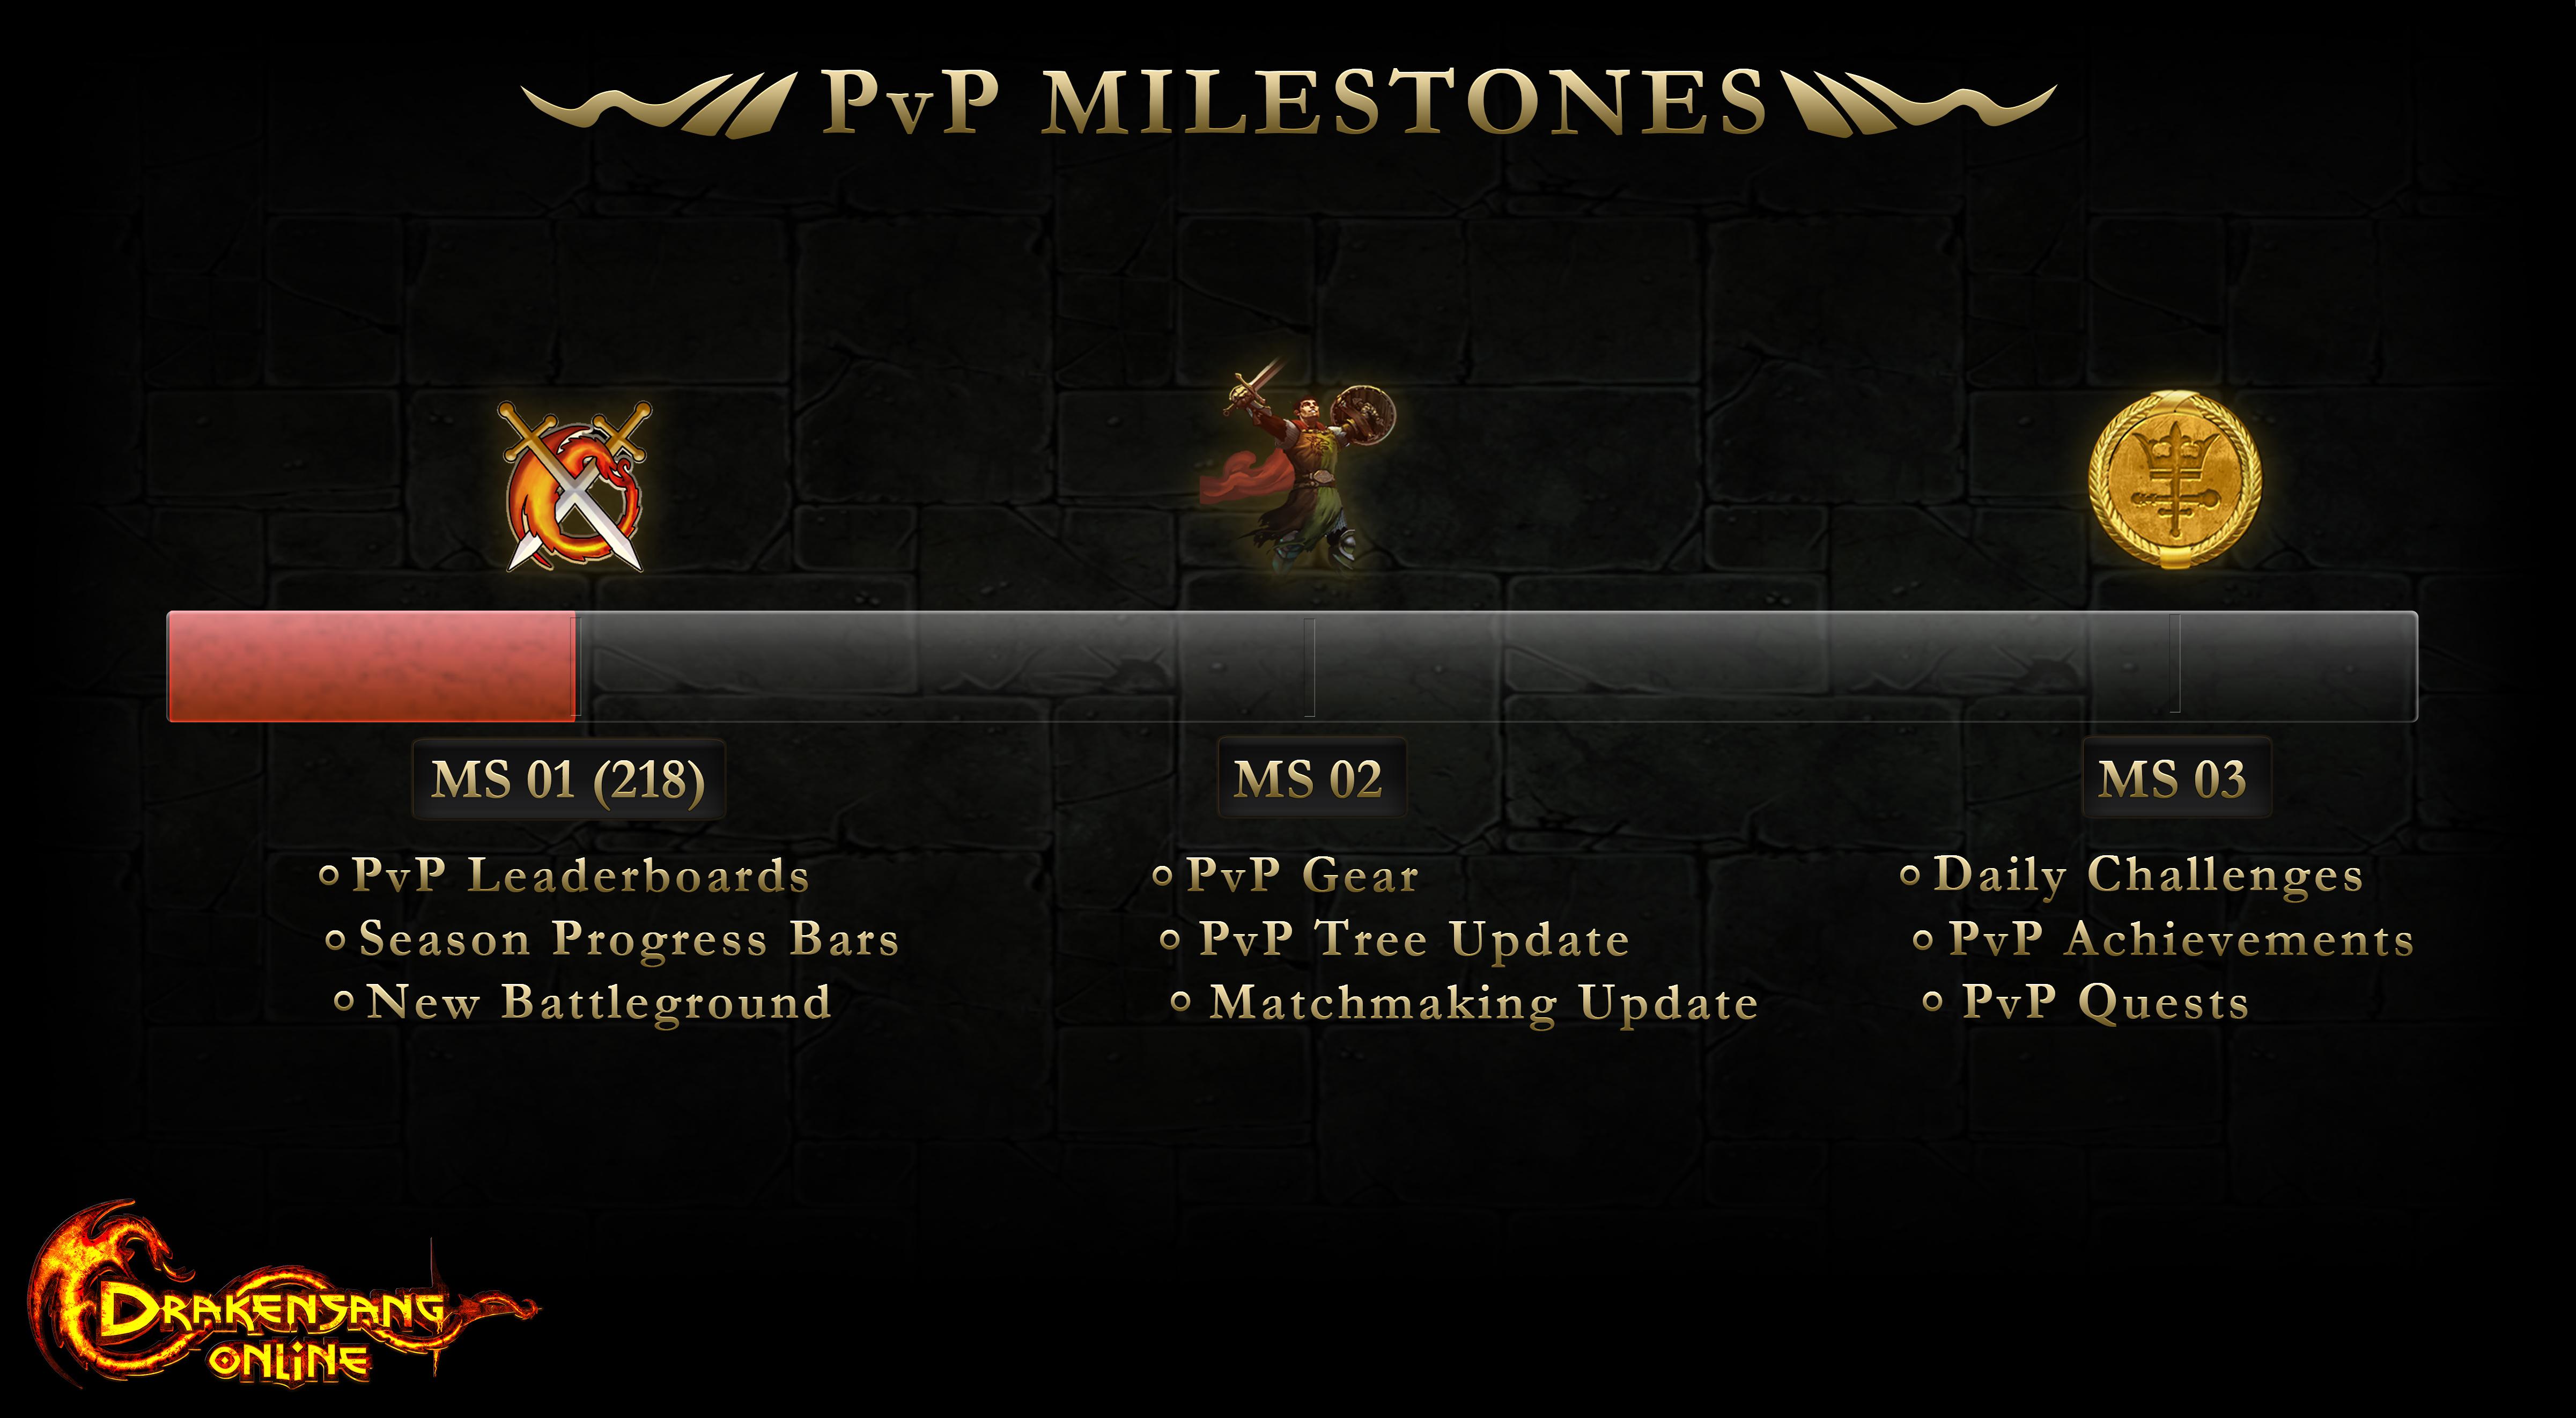 pvp milestones.jpg